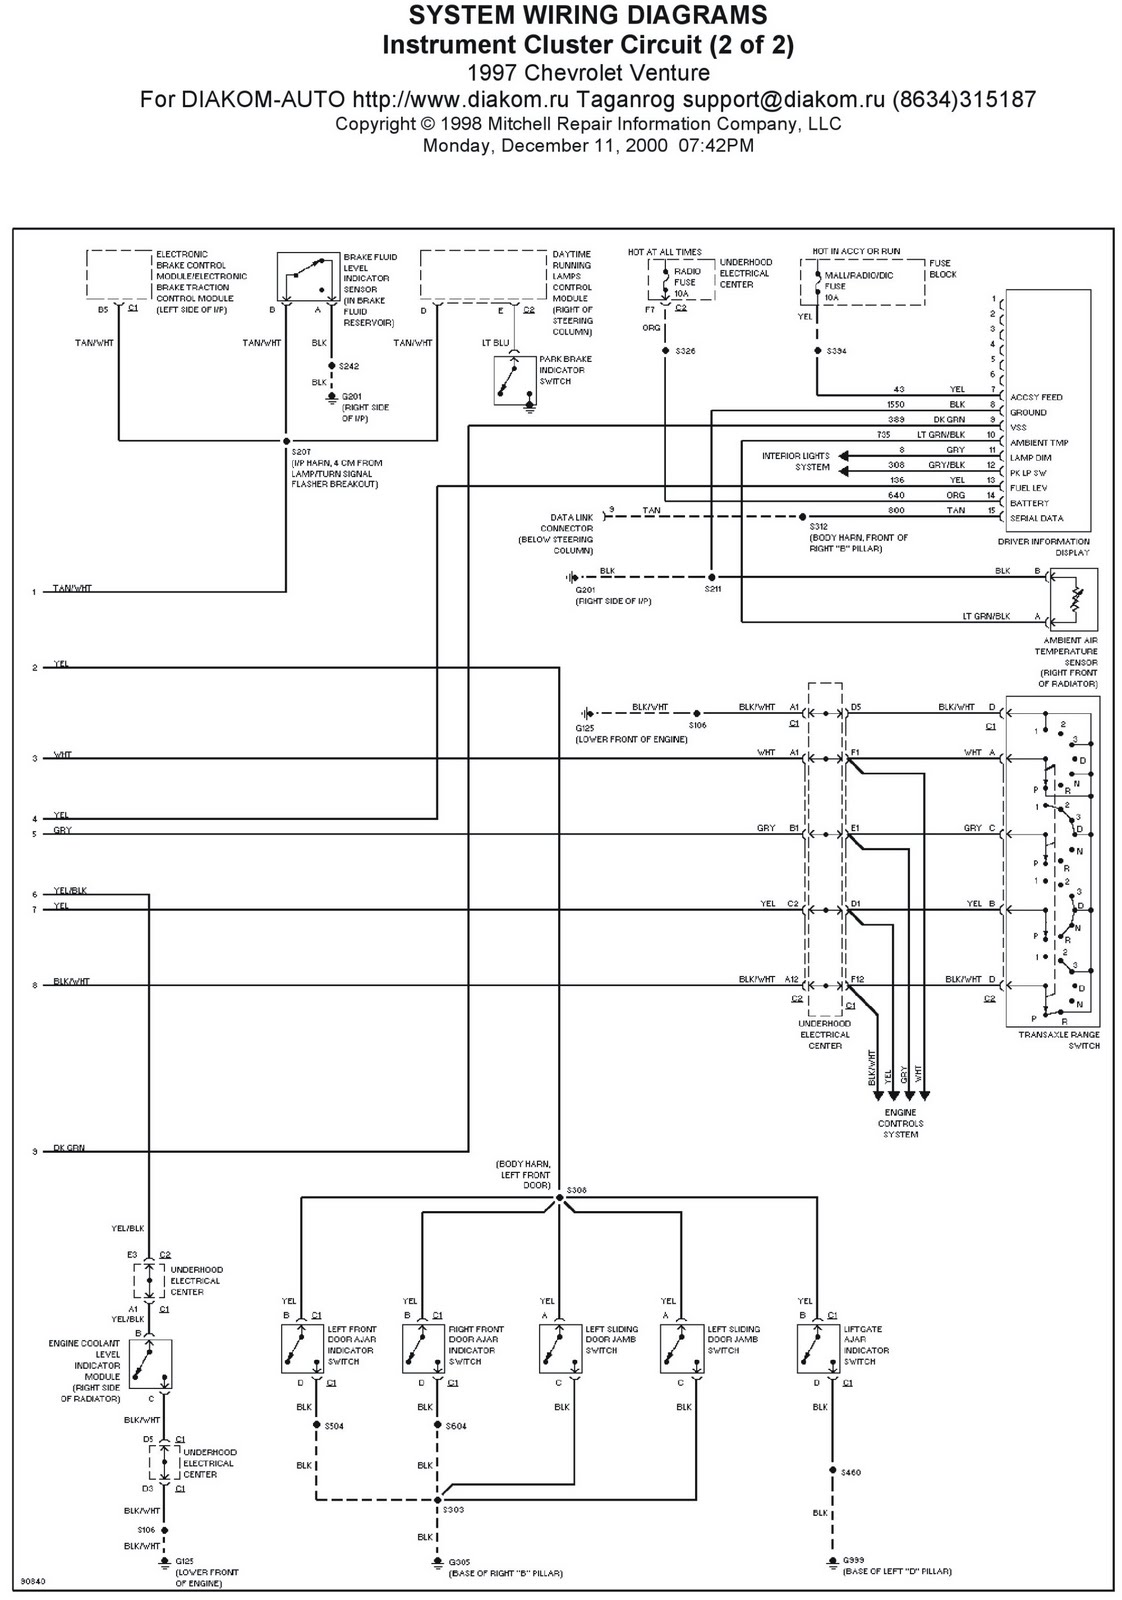 1997 Chevrolet Venture Instrument Cluster Circuit System Wiring Diagrams | Schematic Wiring